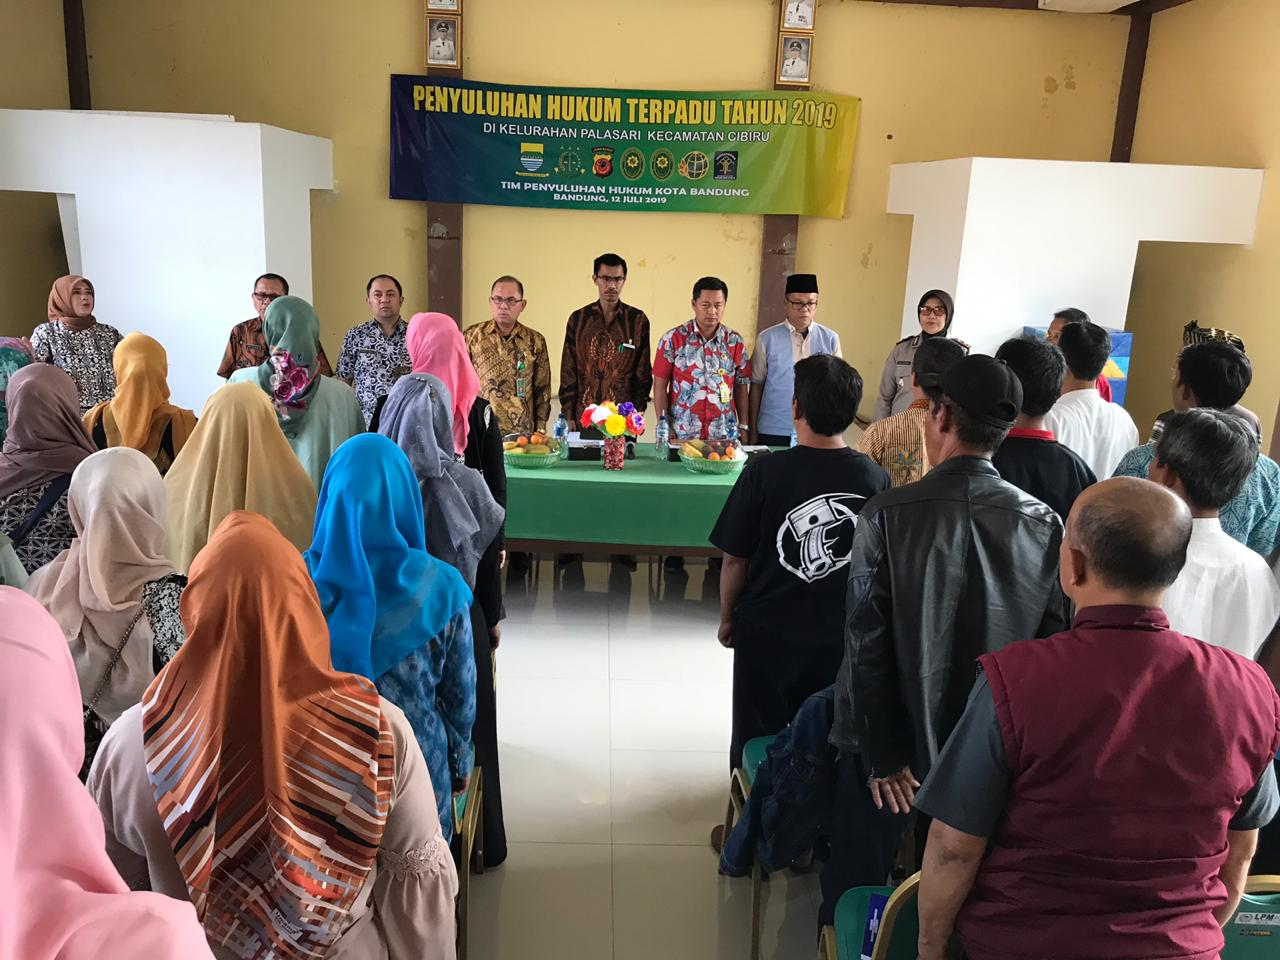 Preview PENYULUHAN HUKUM TERPADU TAHUN 2019 DI KELURAHAN PALASARI KECAMATAN CIBIRU, 12 JULI 2019